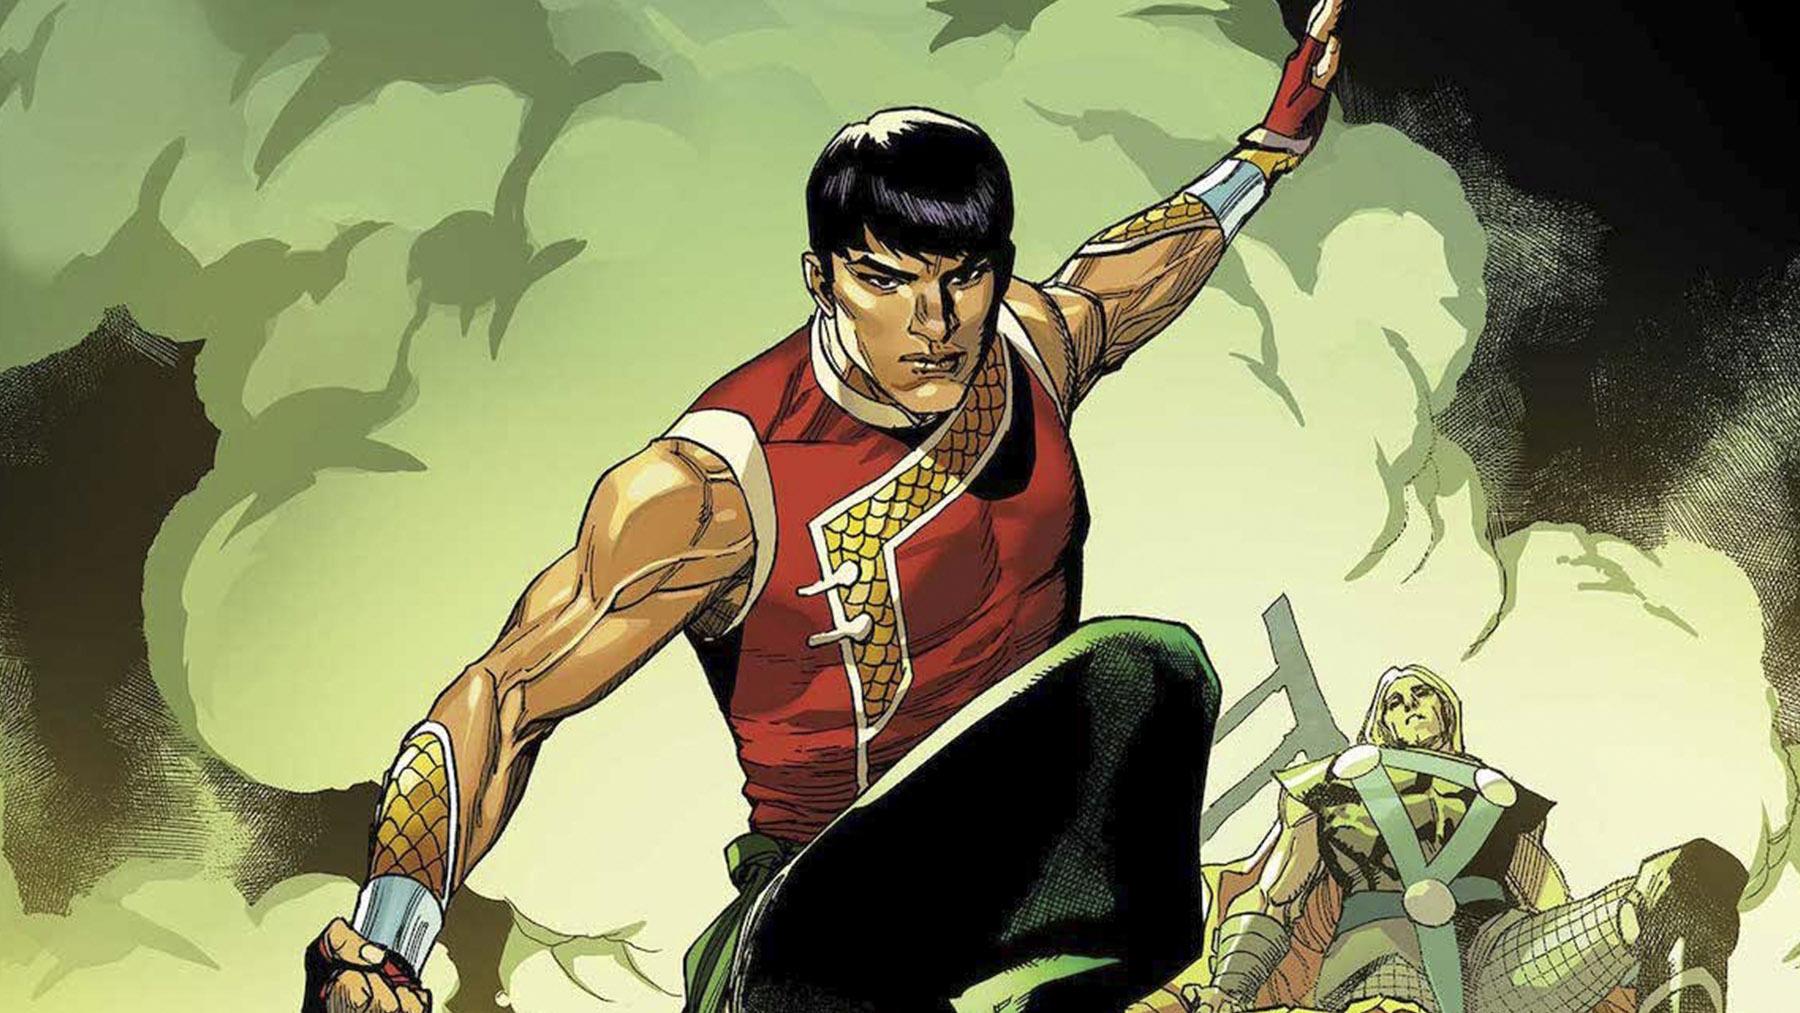 Shang-chi (Marvel/Disney)